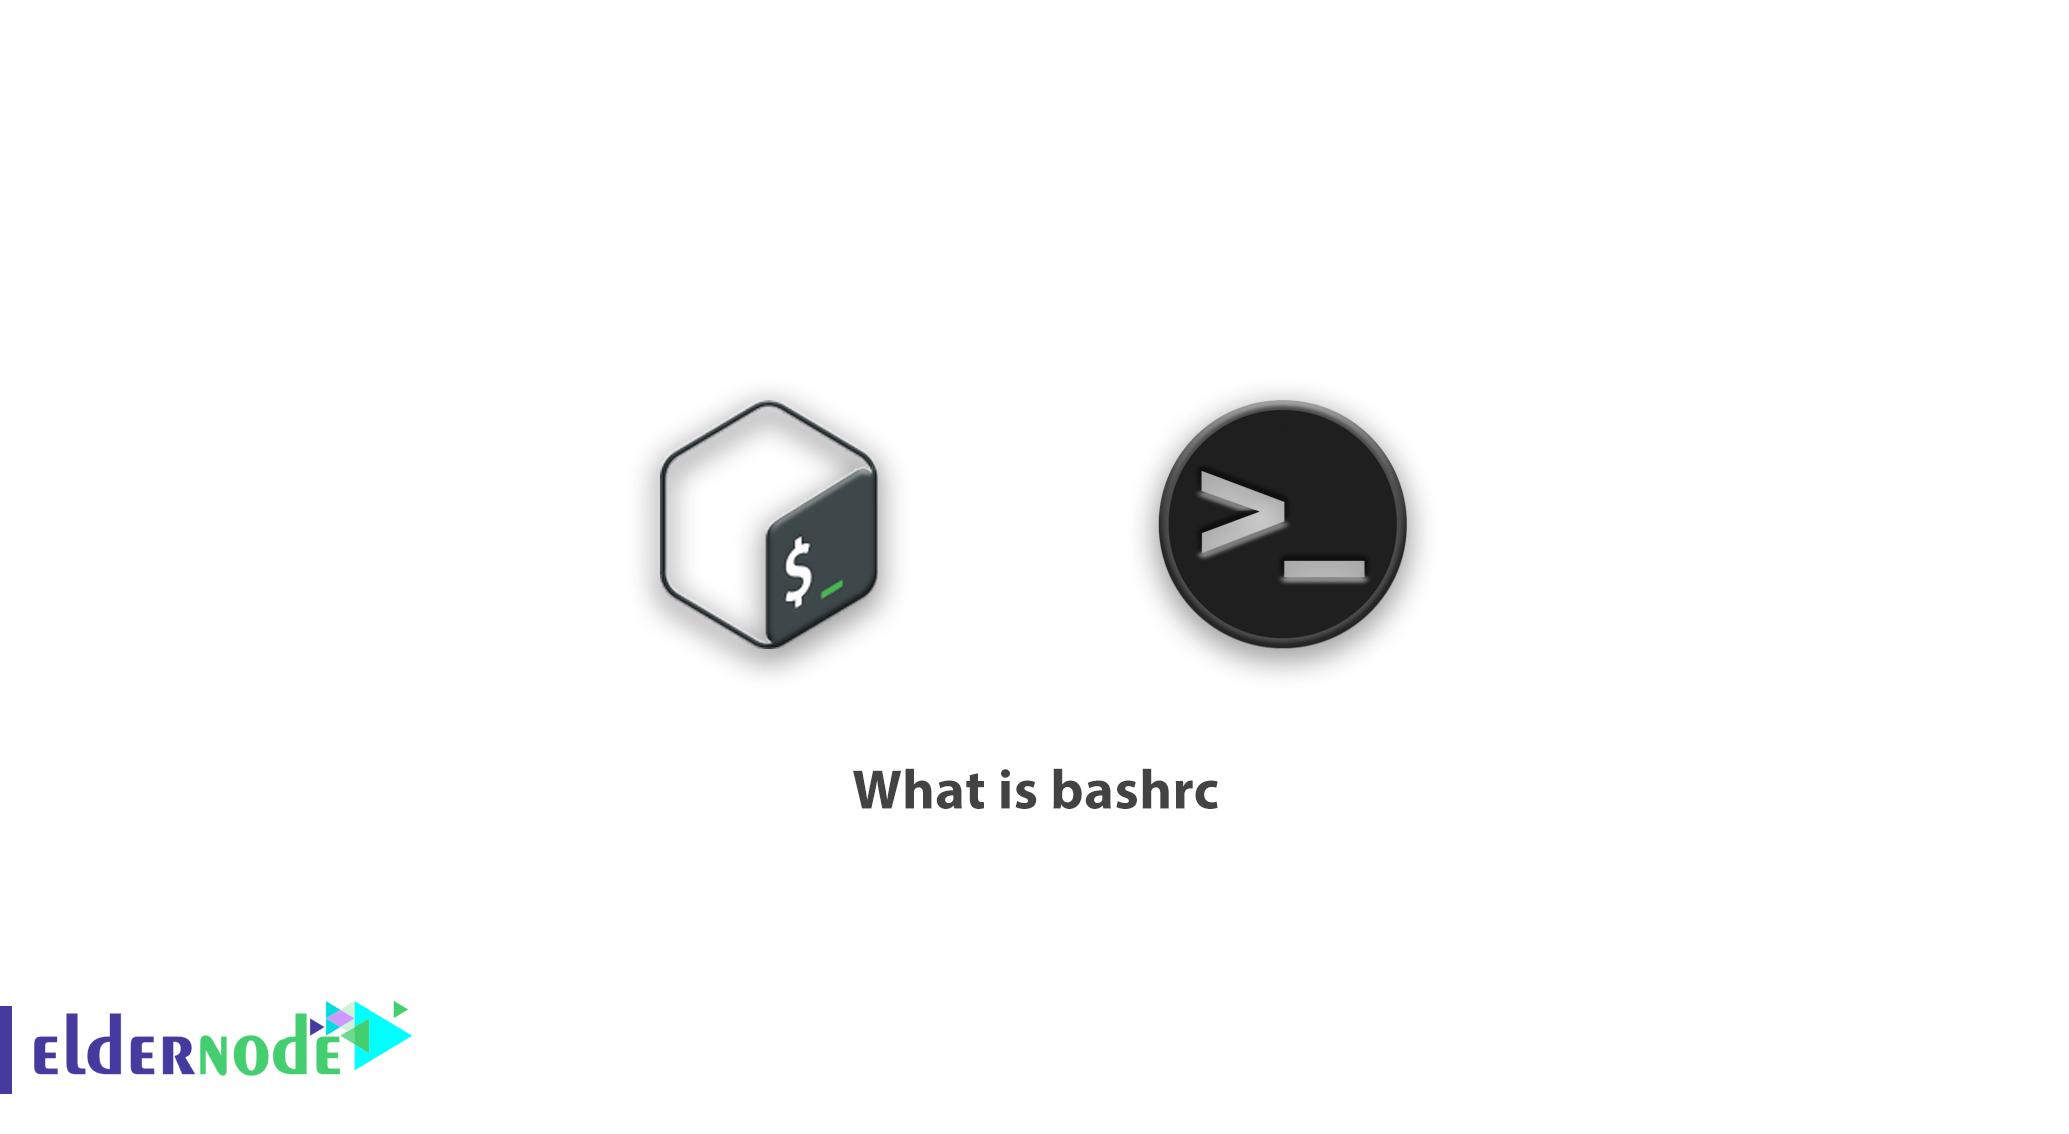 What is bashrc